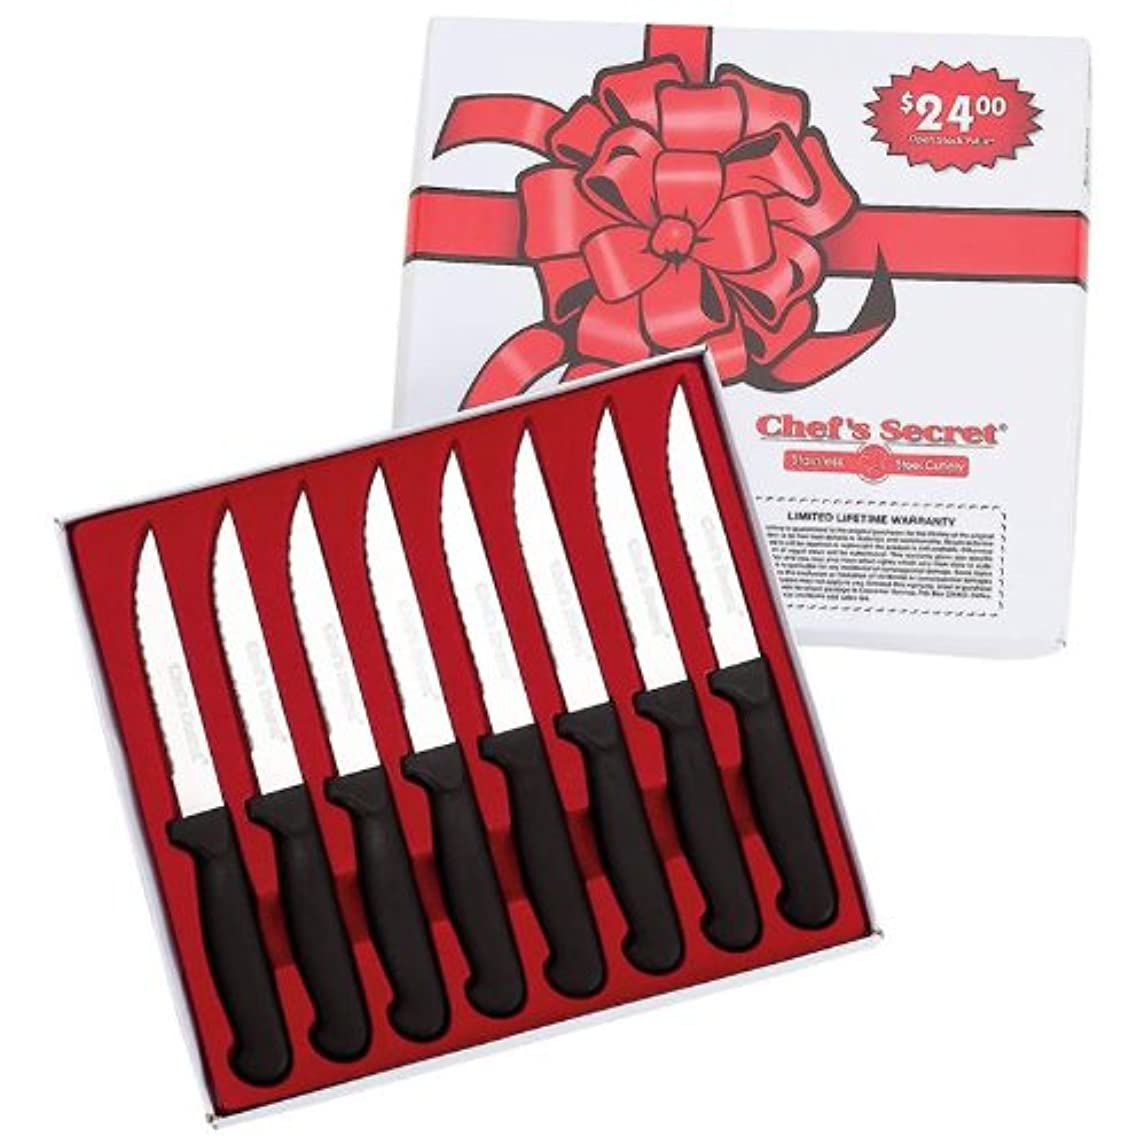 Chef CTCS8 8 Piece Steak Knife Set